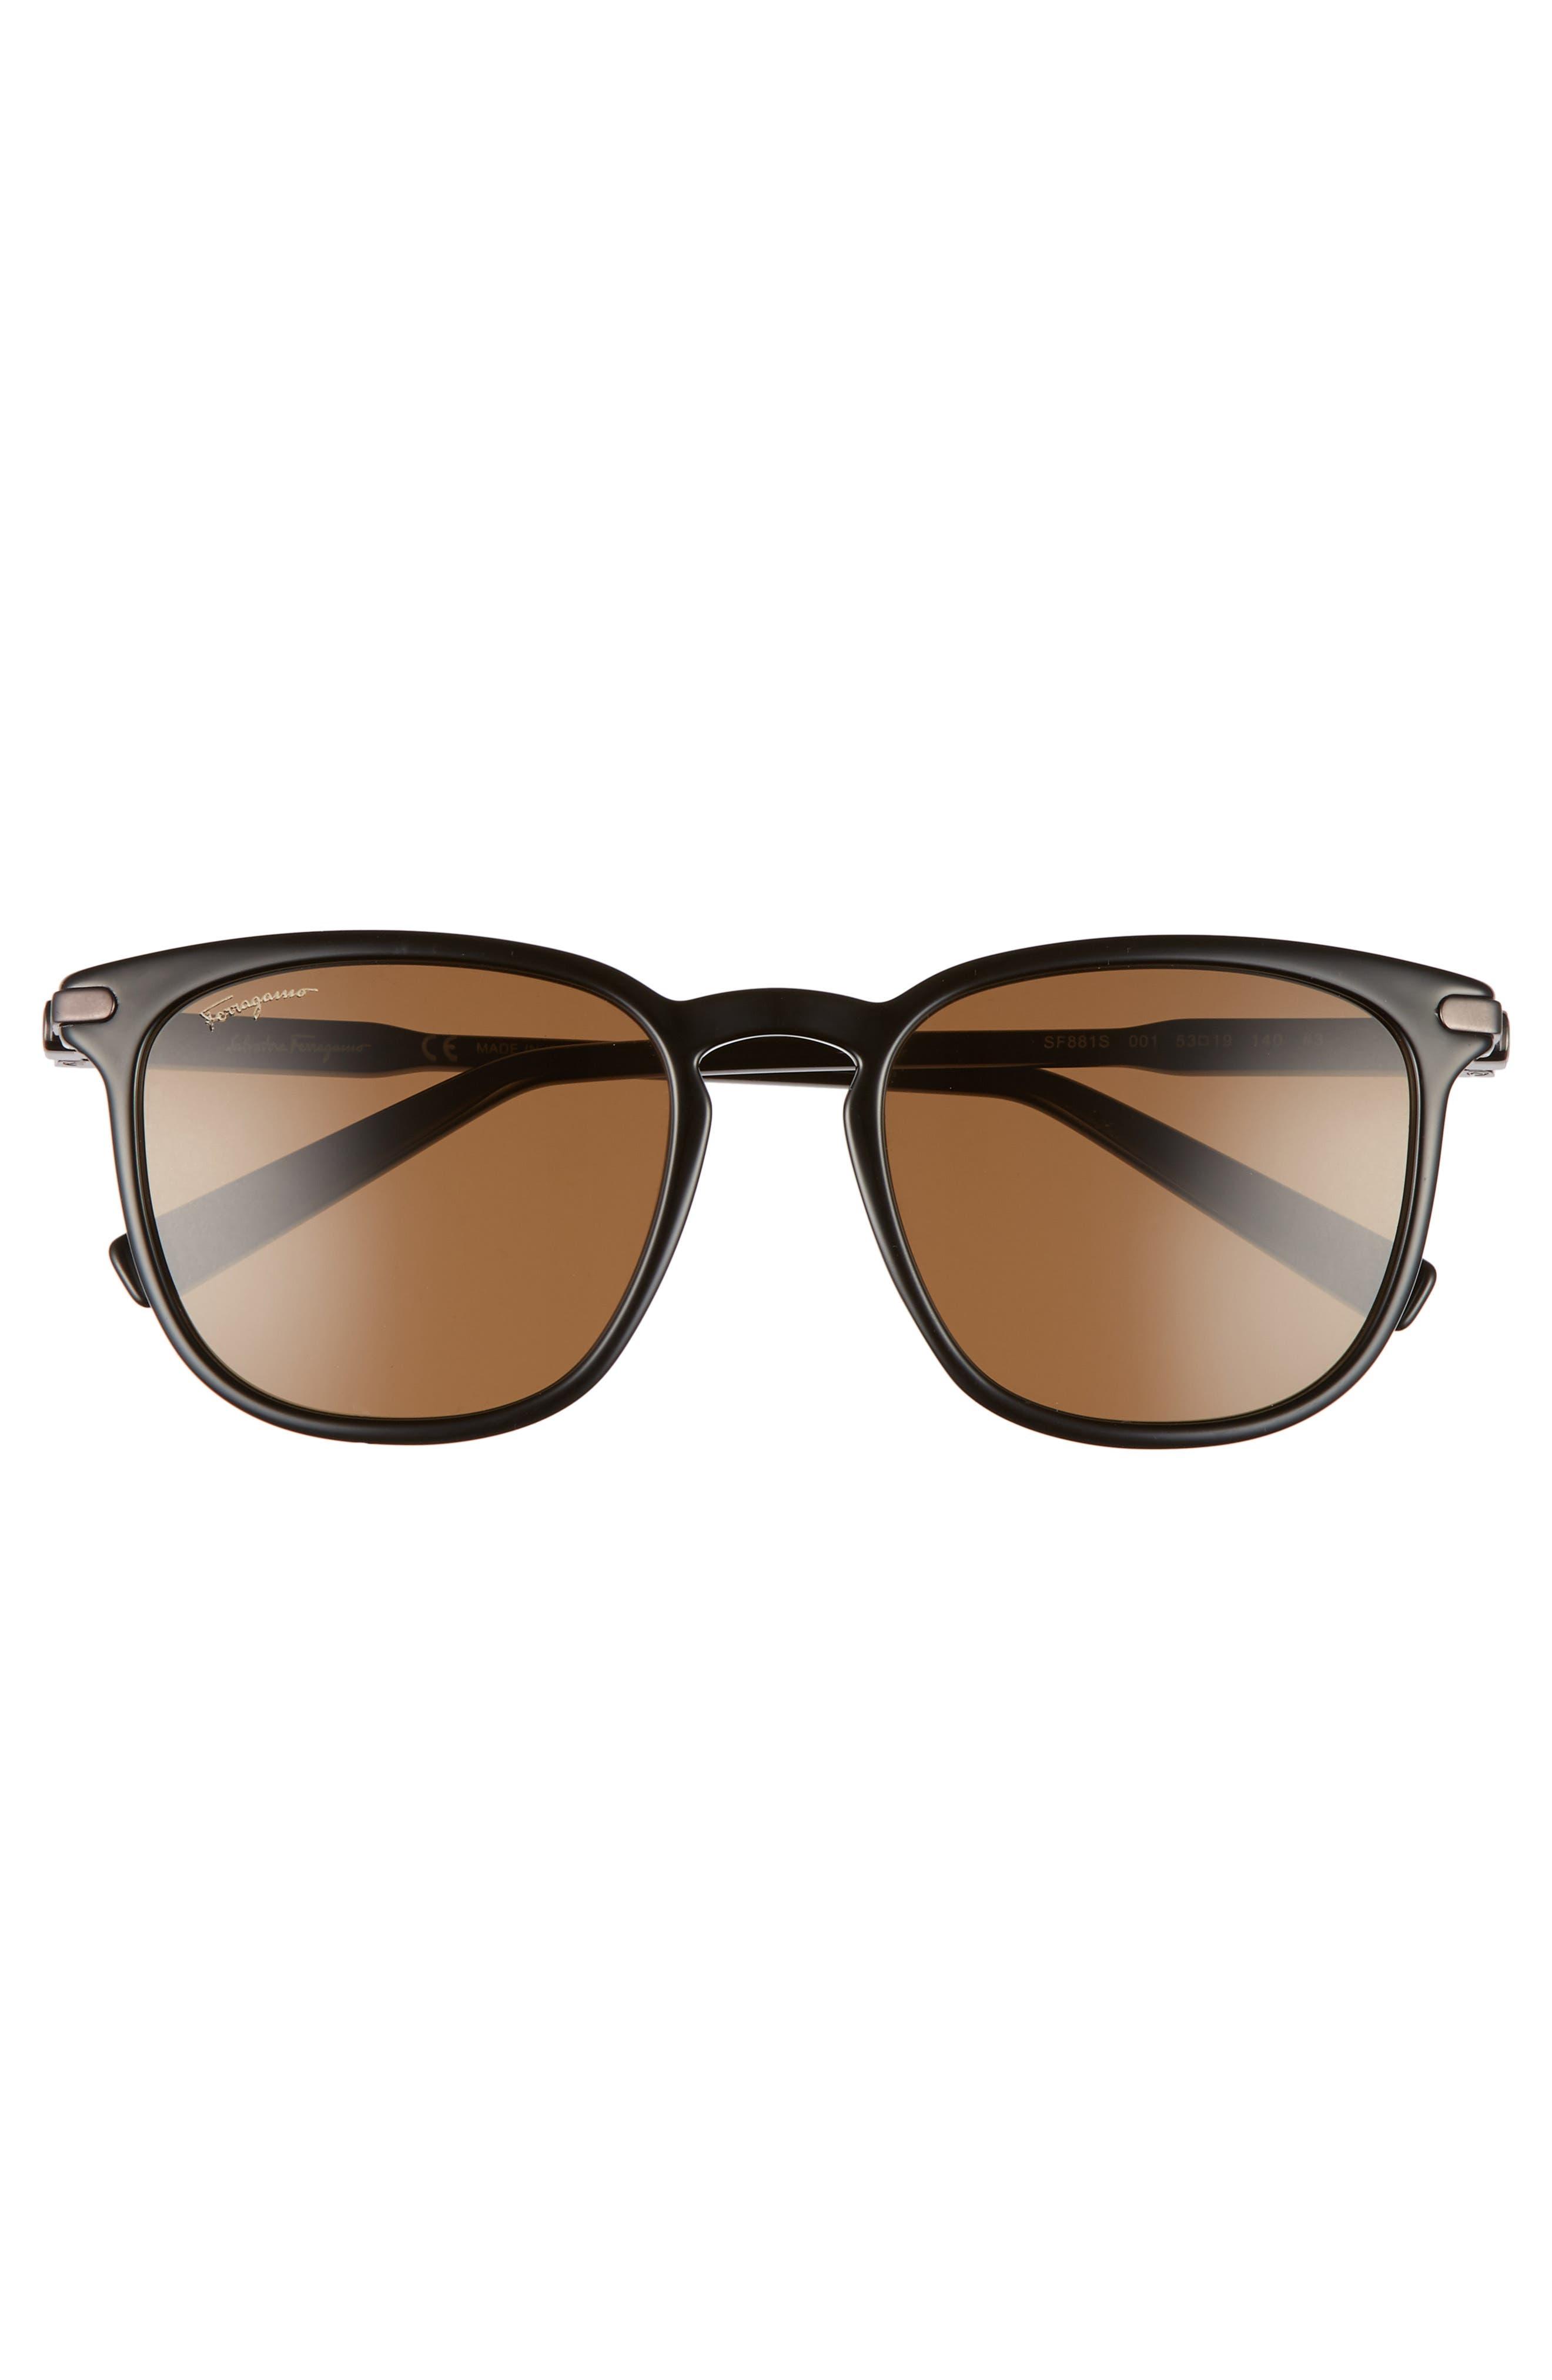 Double Gancio 53mm Sunglasses,                             Alternate thumbnail 2, color,                             BLACK